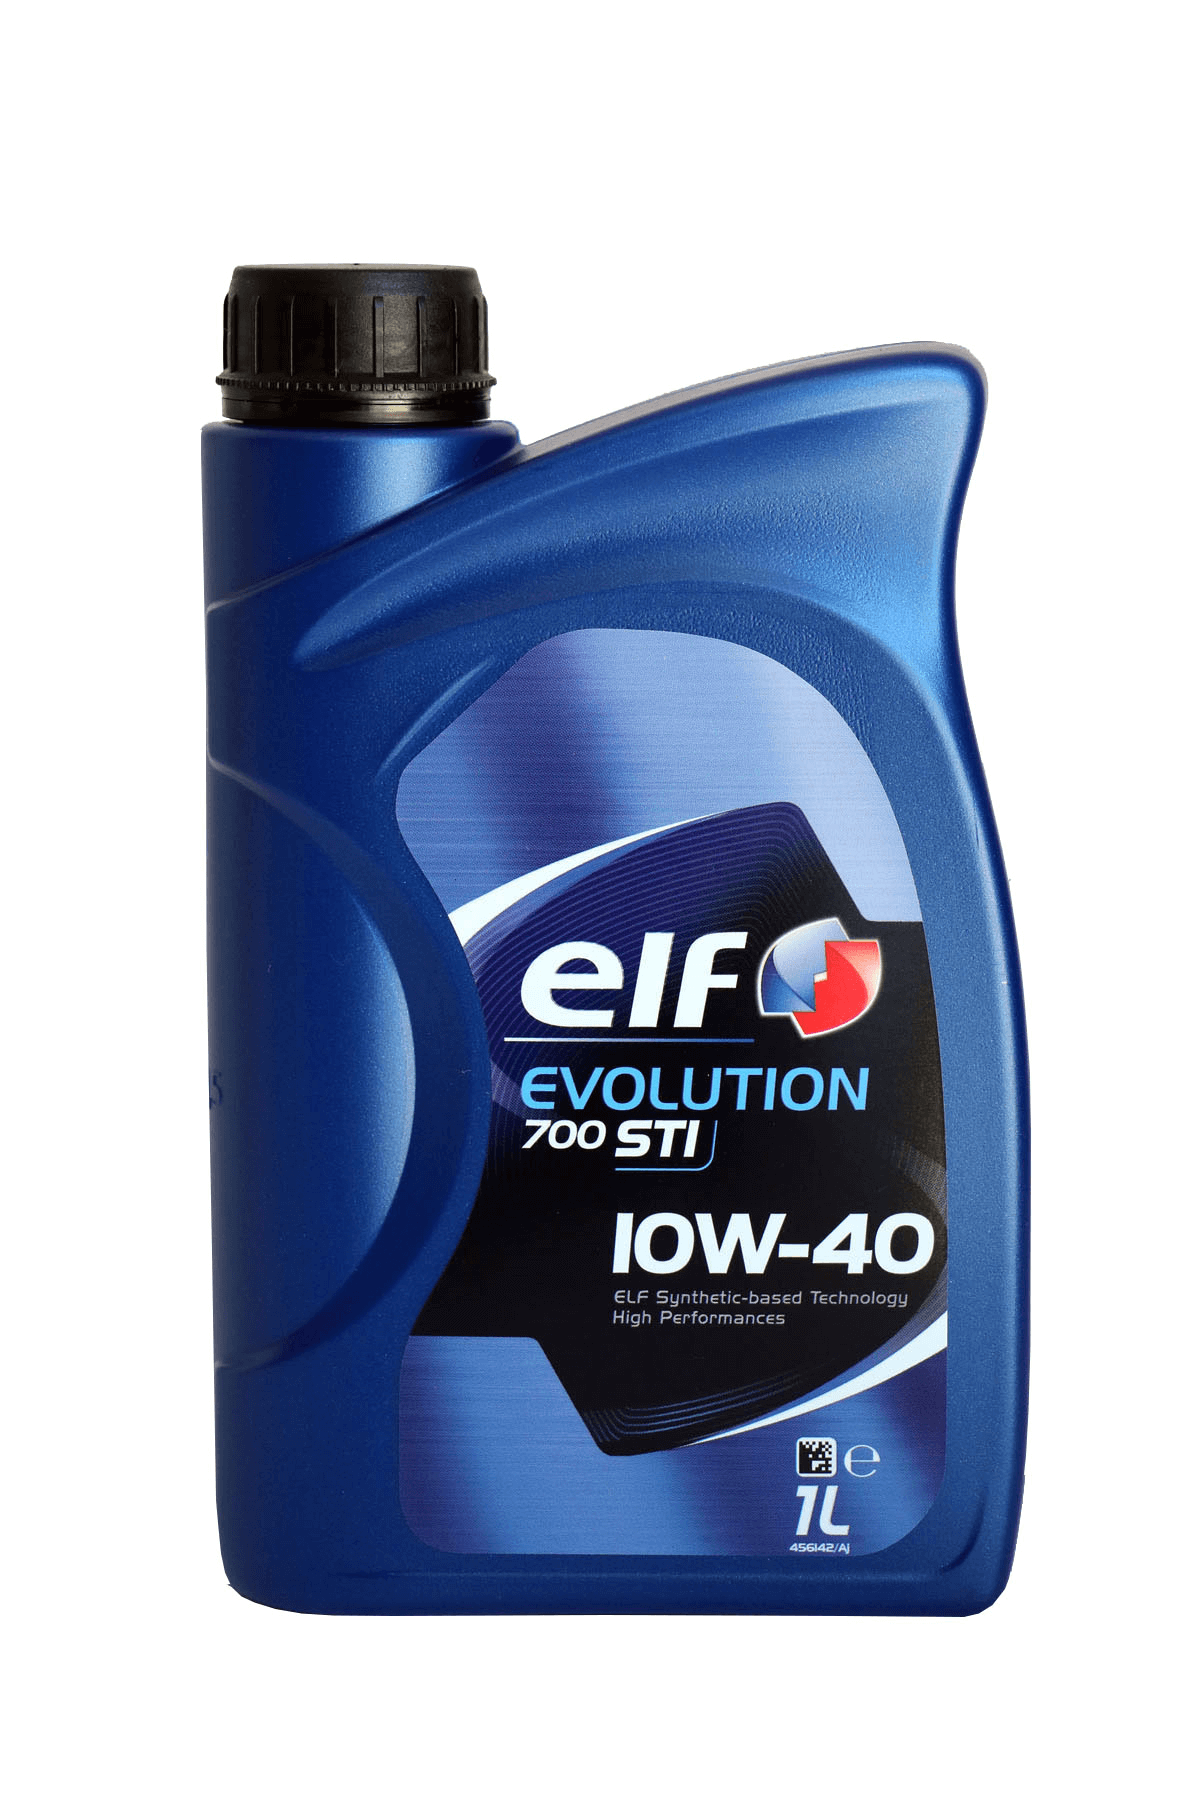 ELF Evolution 700 STI 10W-40 Motoröl, 1l